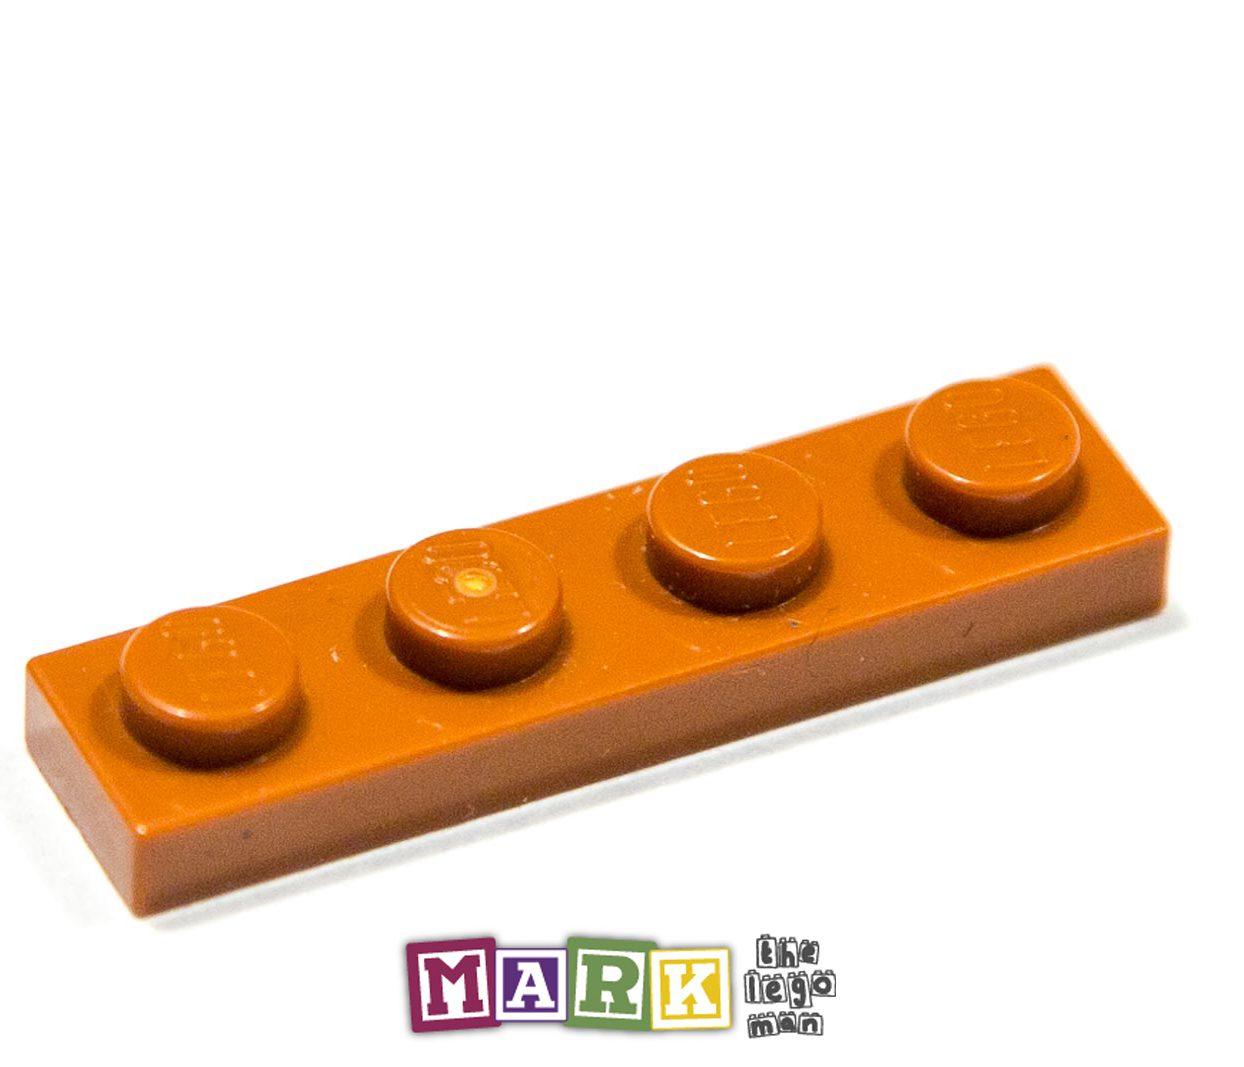 Lego 3710 1x4 RARE COLOUR Plate 4164448